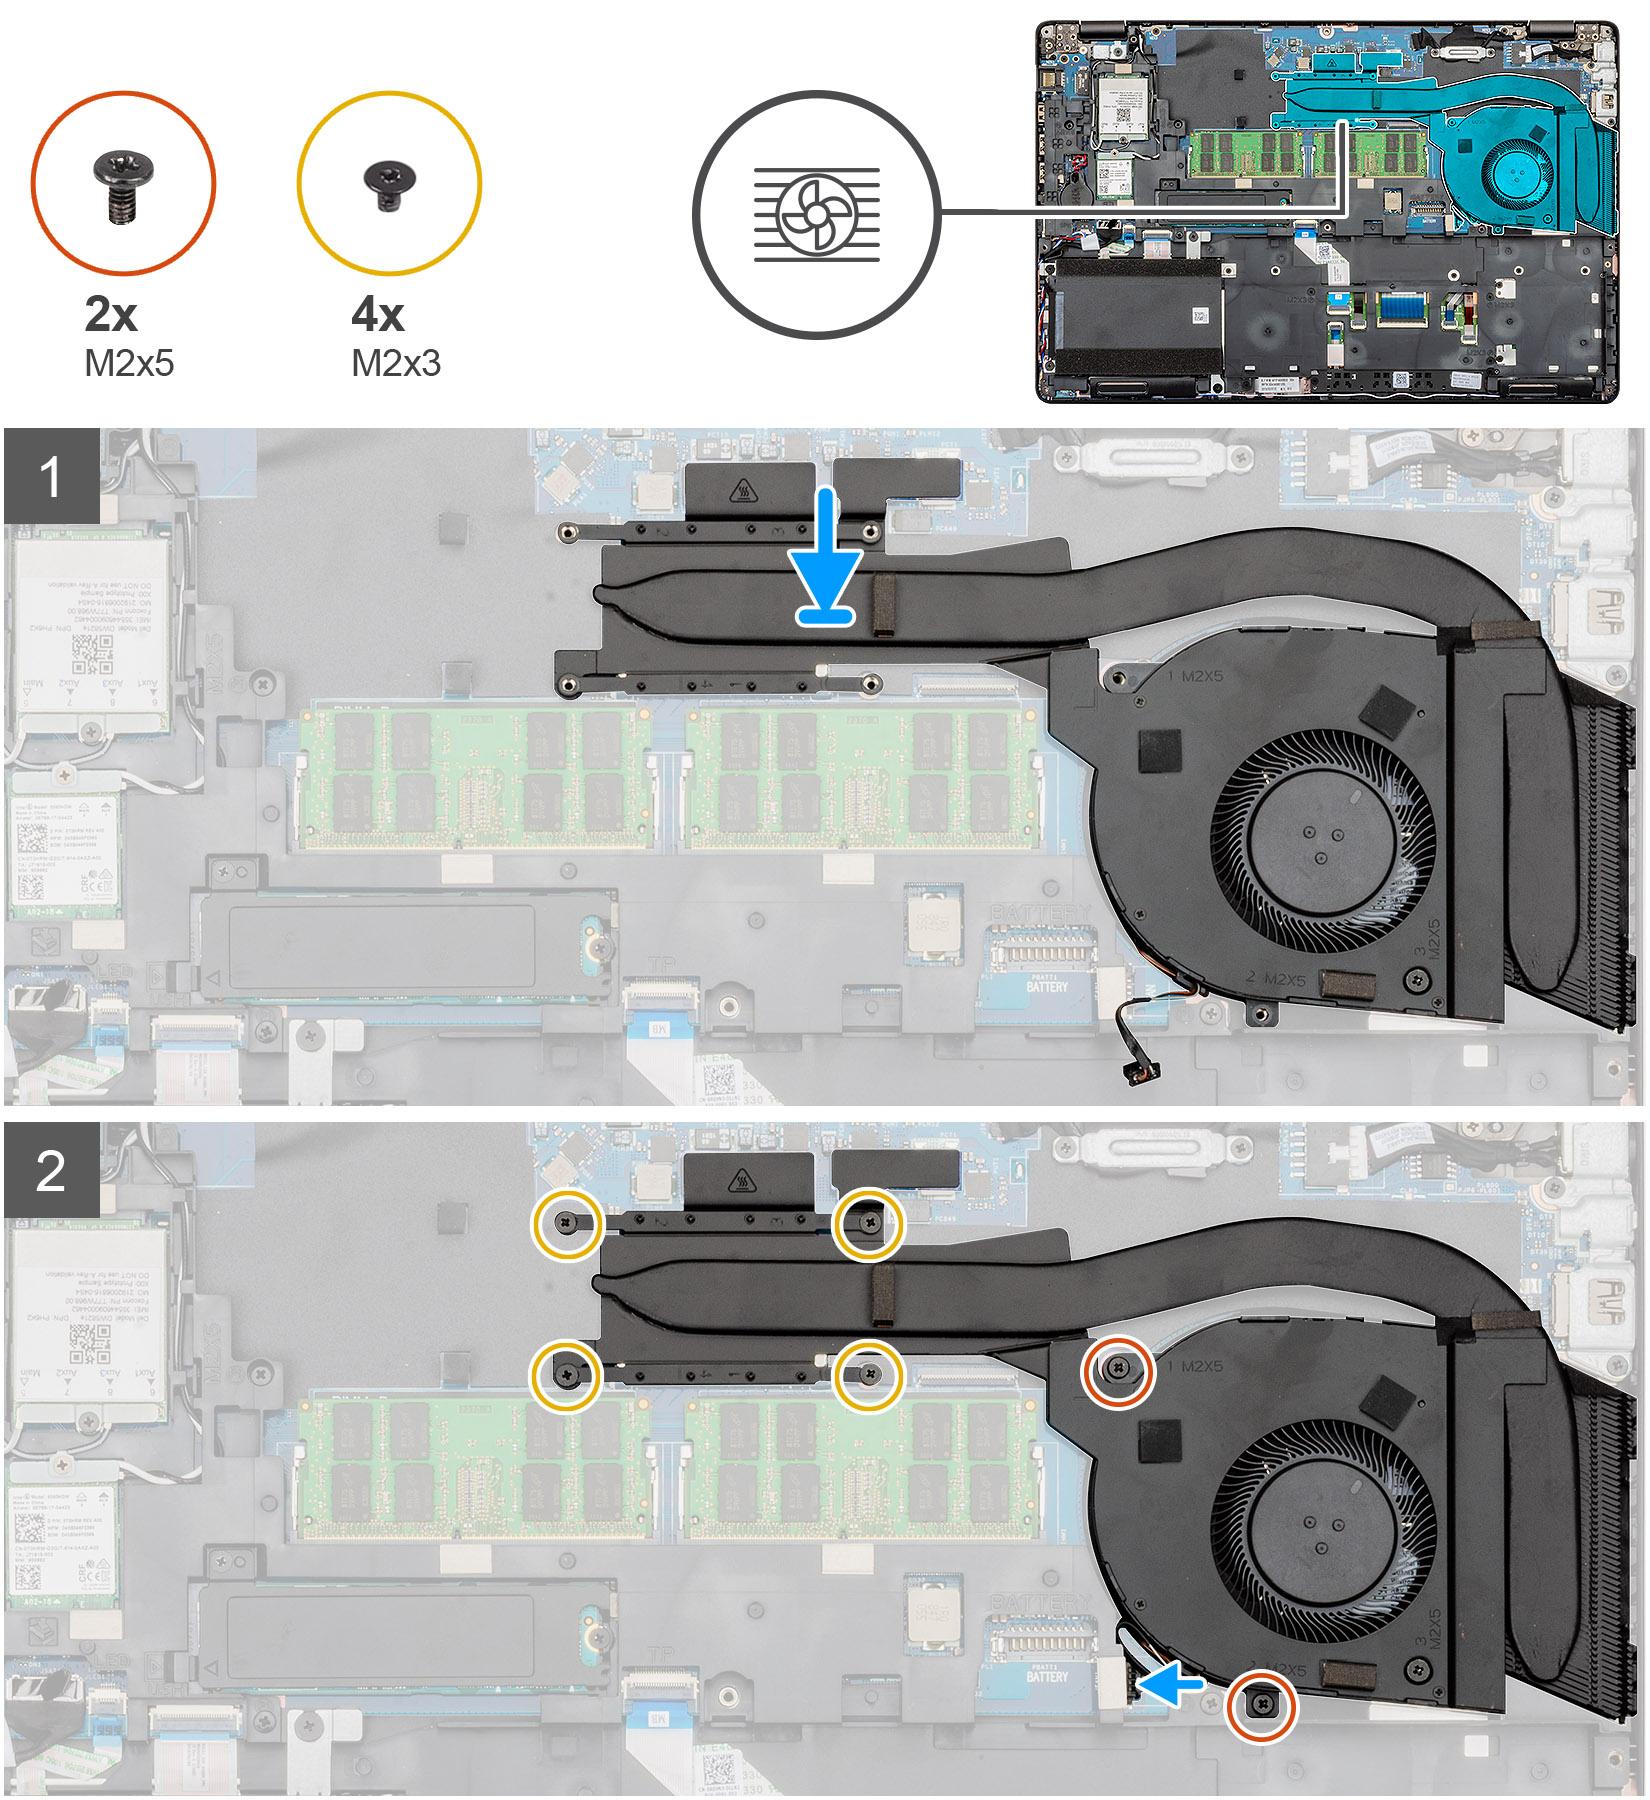 Installing the Heatsink-UMA